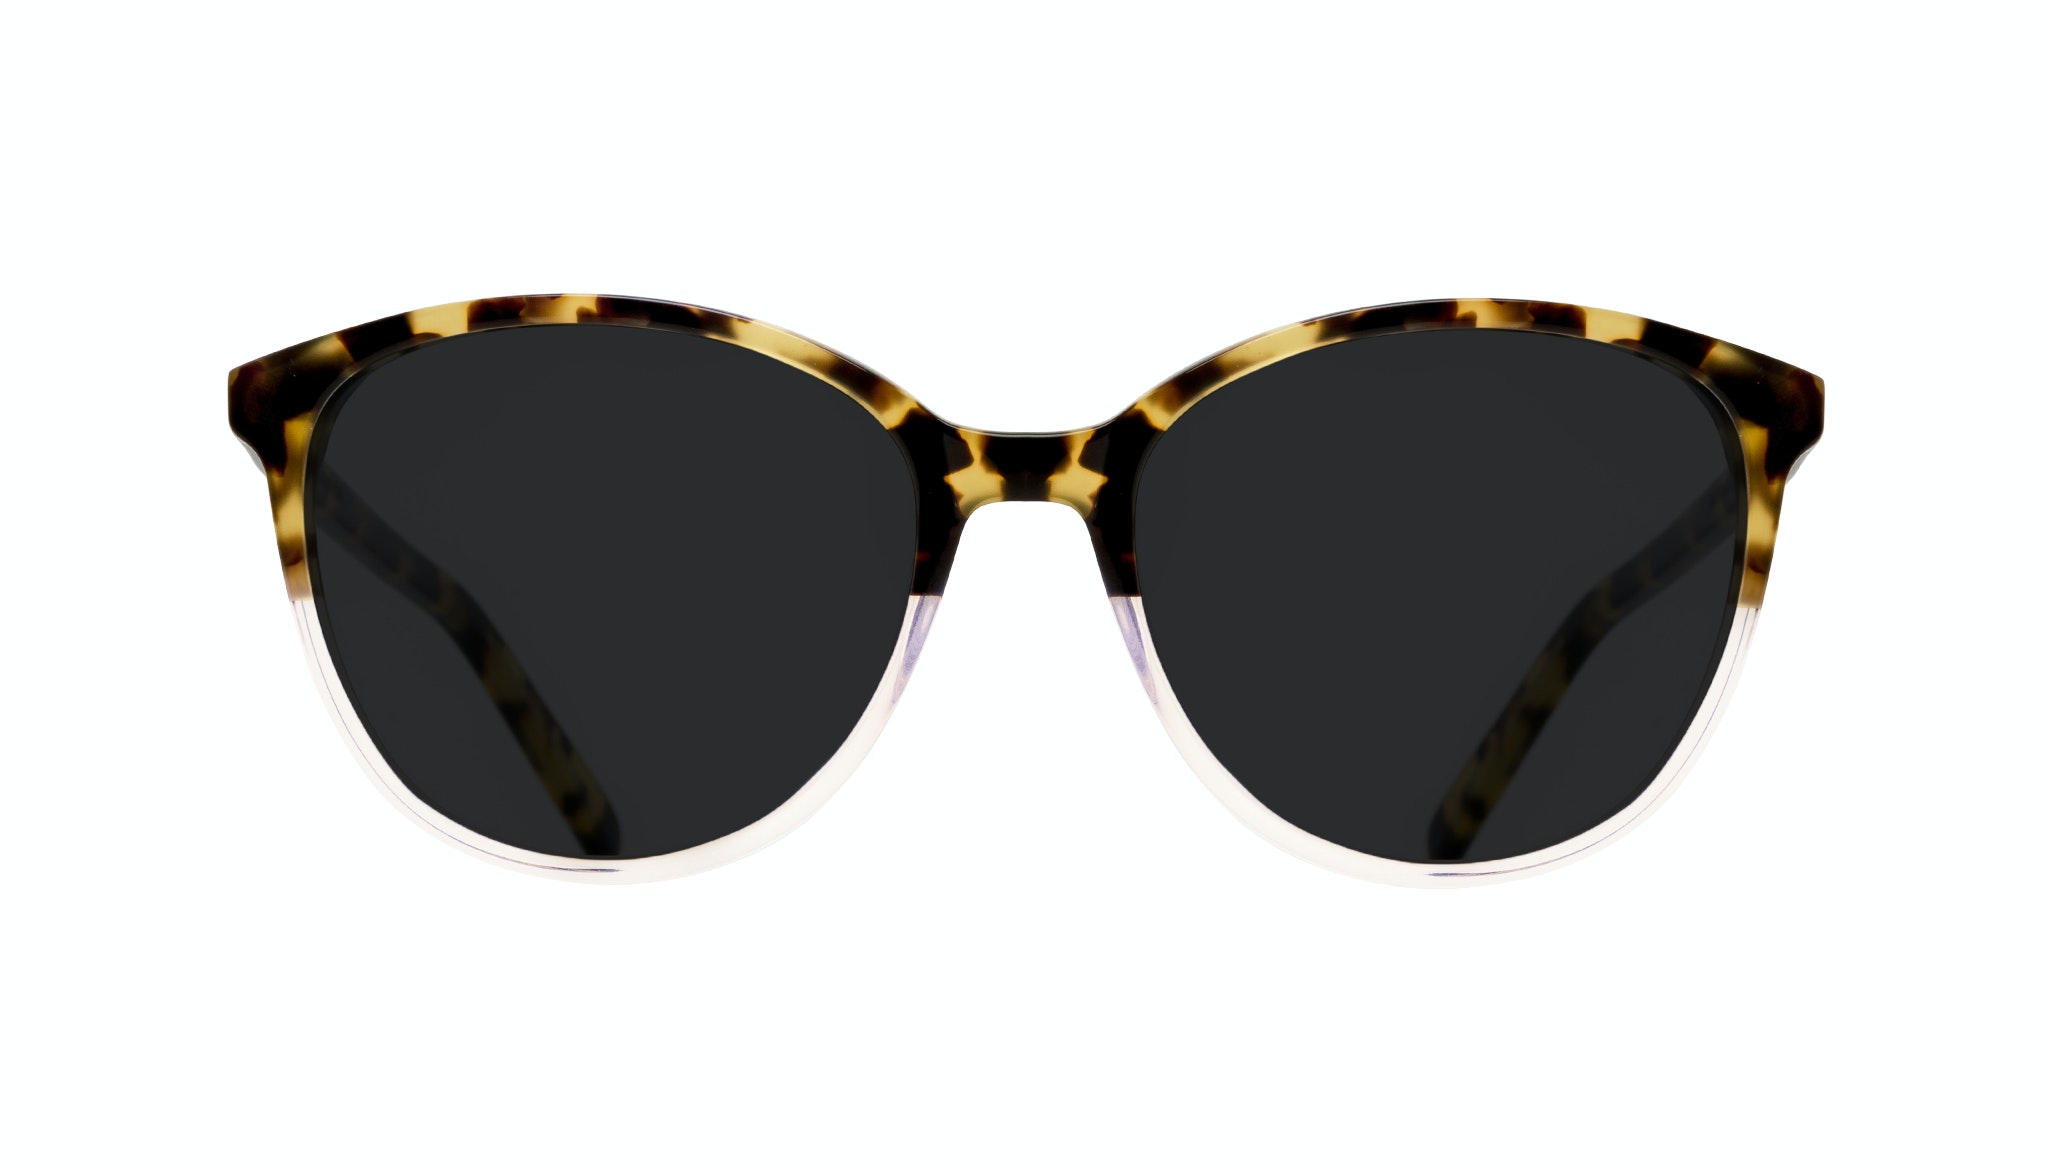 Affordable Fashion Glasses Cat Eye Round Sunglasses Women Imagine Blond Tort Front